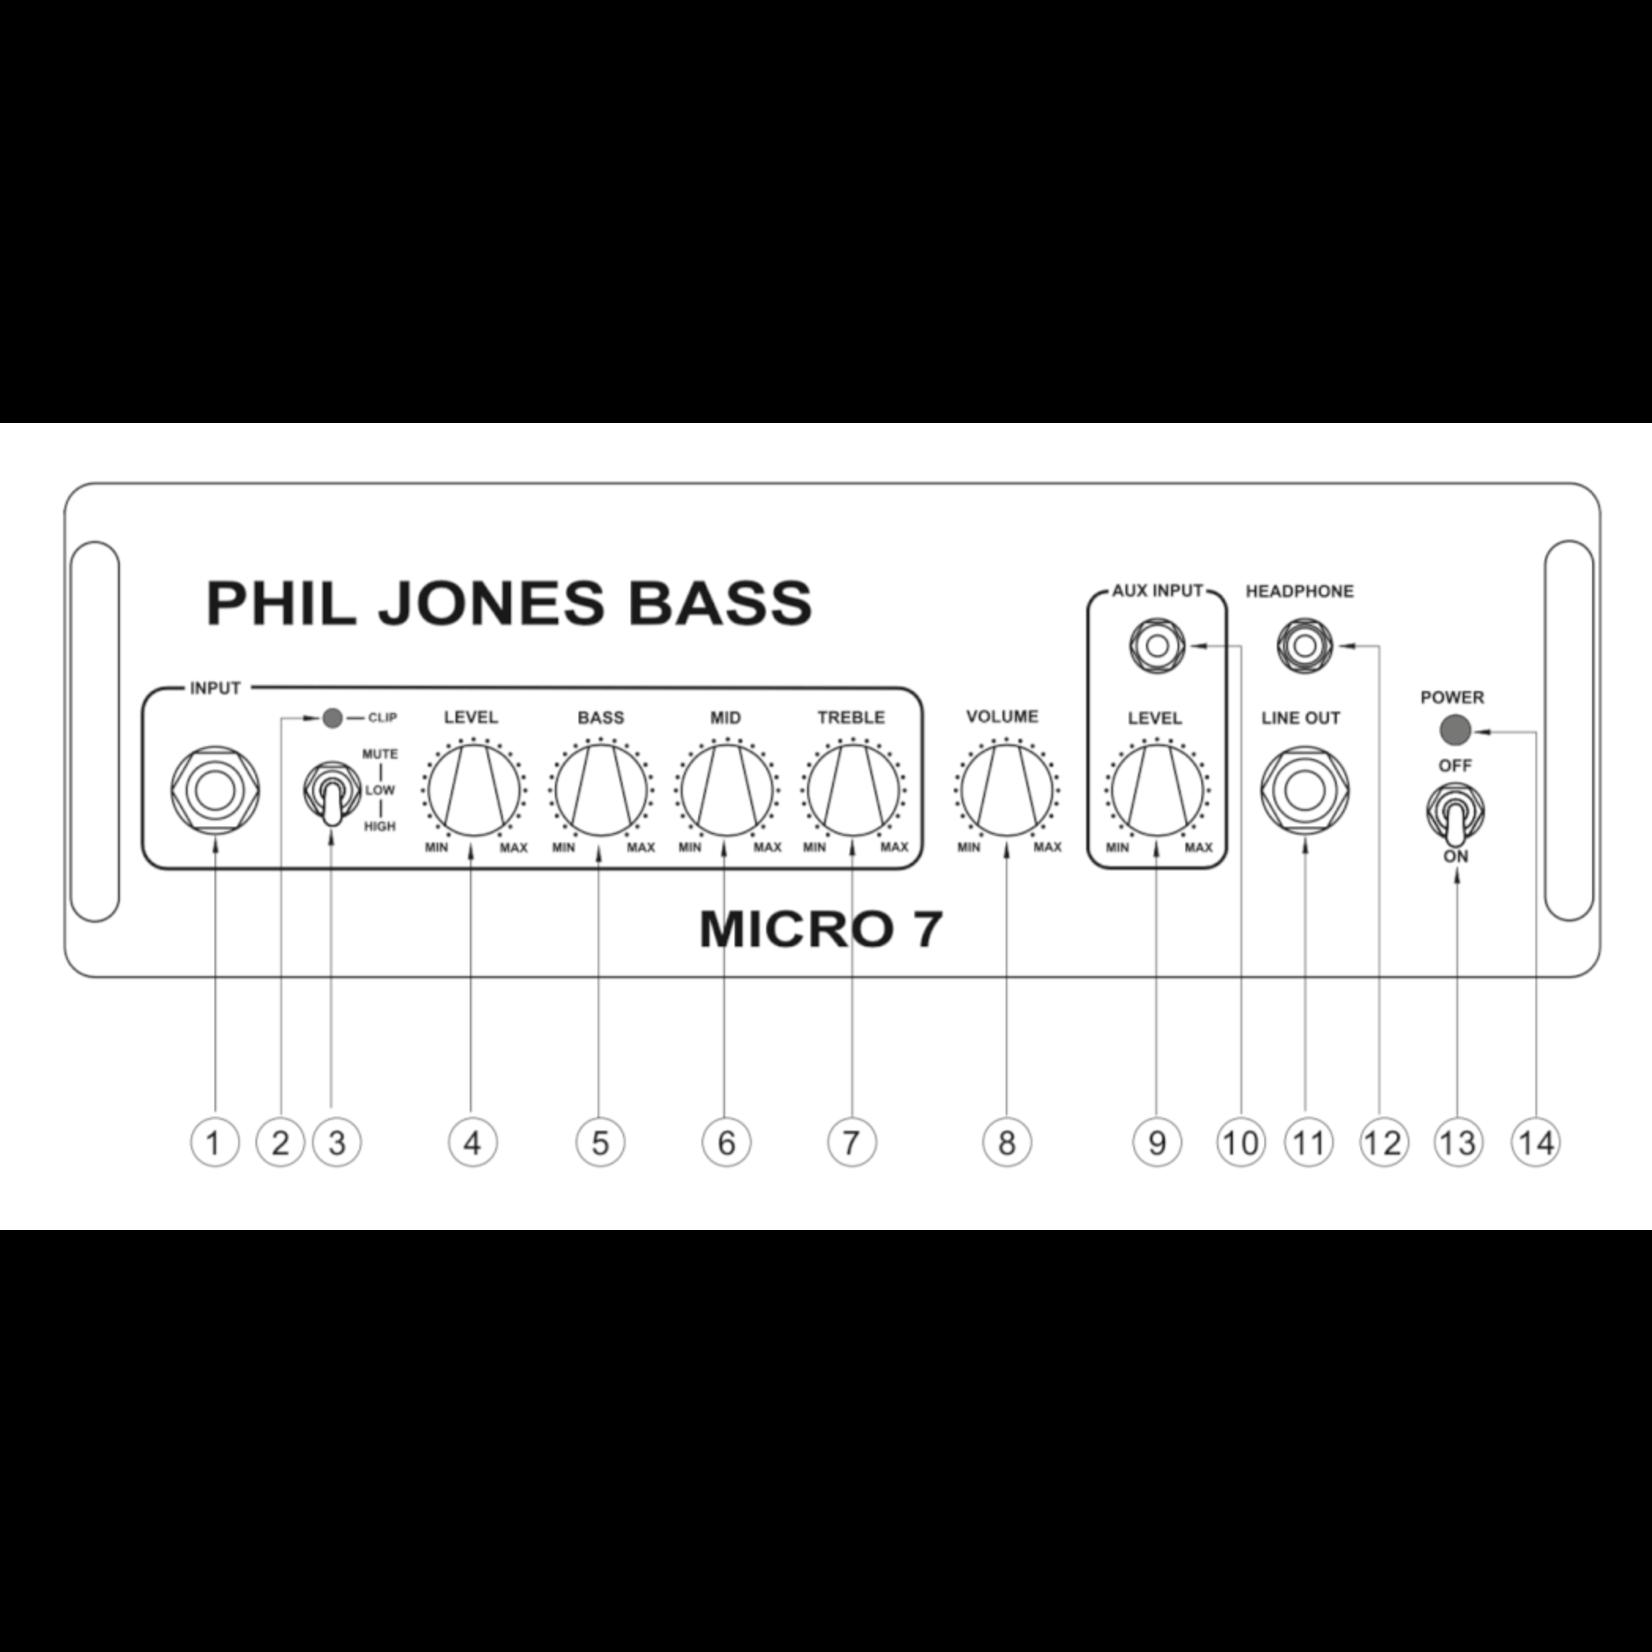 Phil Jones Phil Jones Bass Micro 7 - Hi Fidelity 50W Combo Bass Amplifier